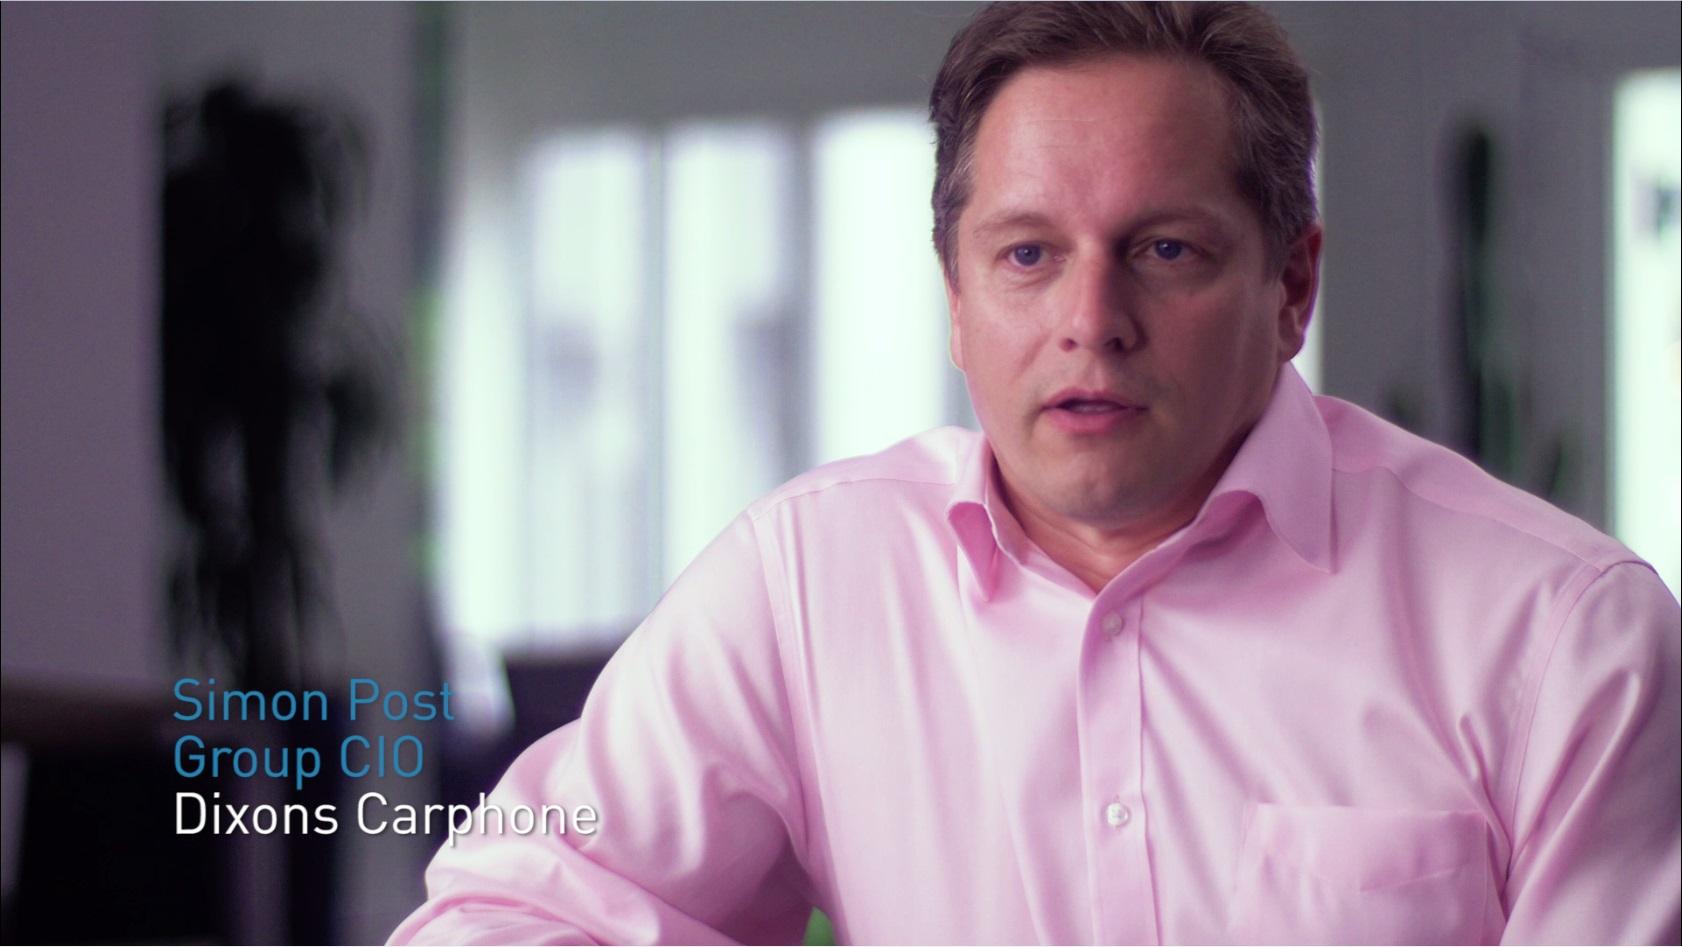 Interview: Dixons Carphone CIO, Simon Post - MuleSoft Videos